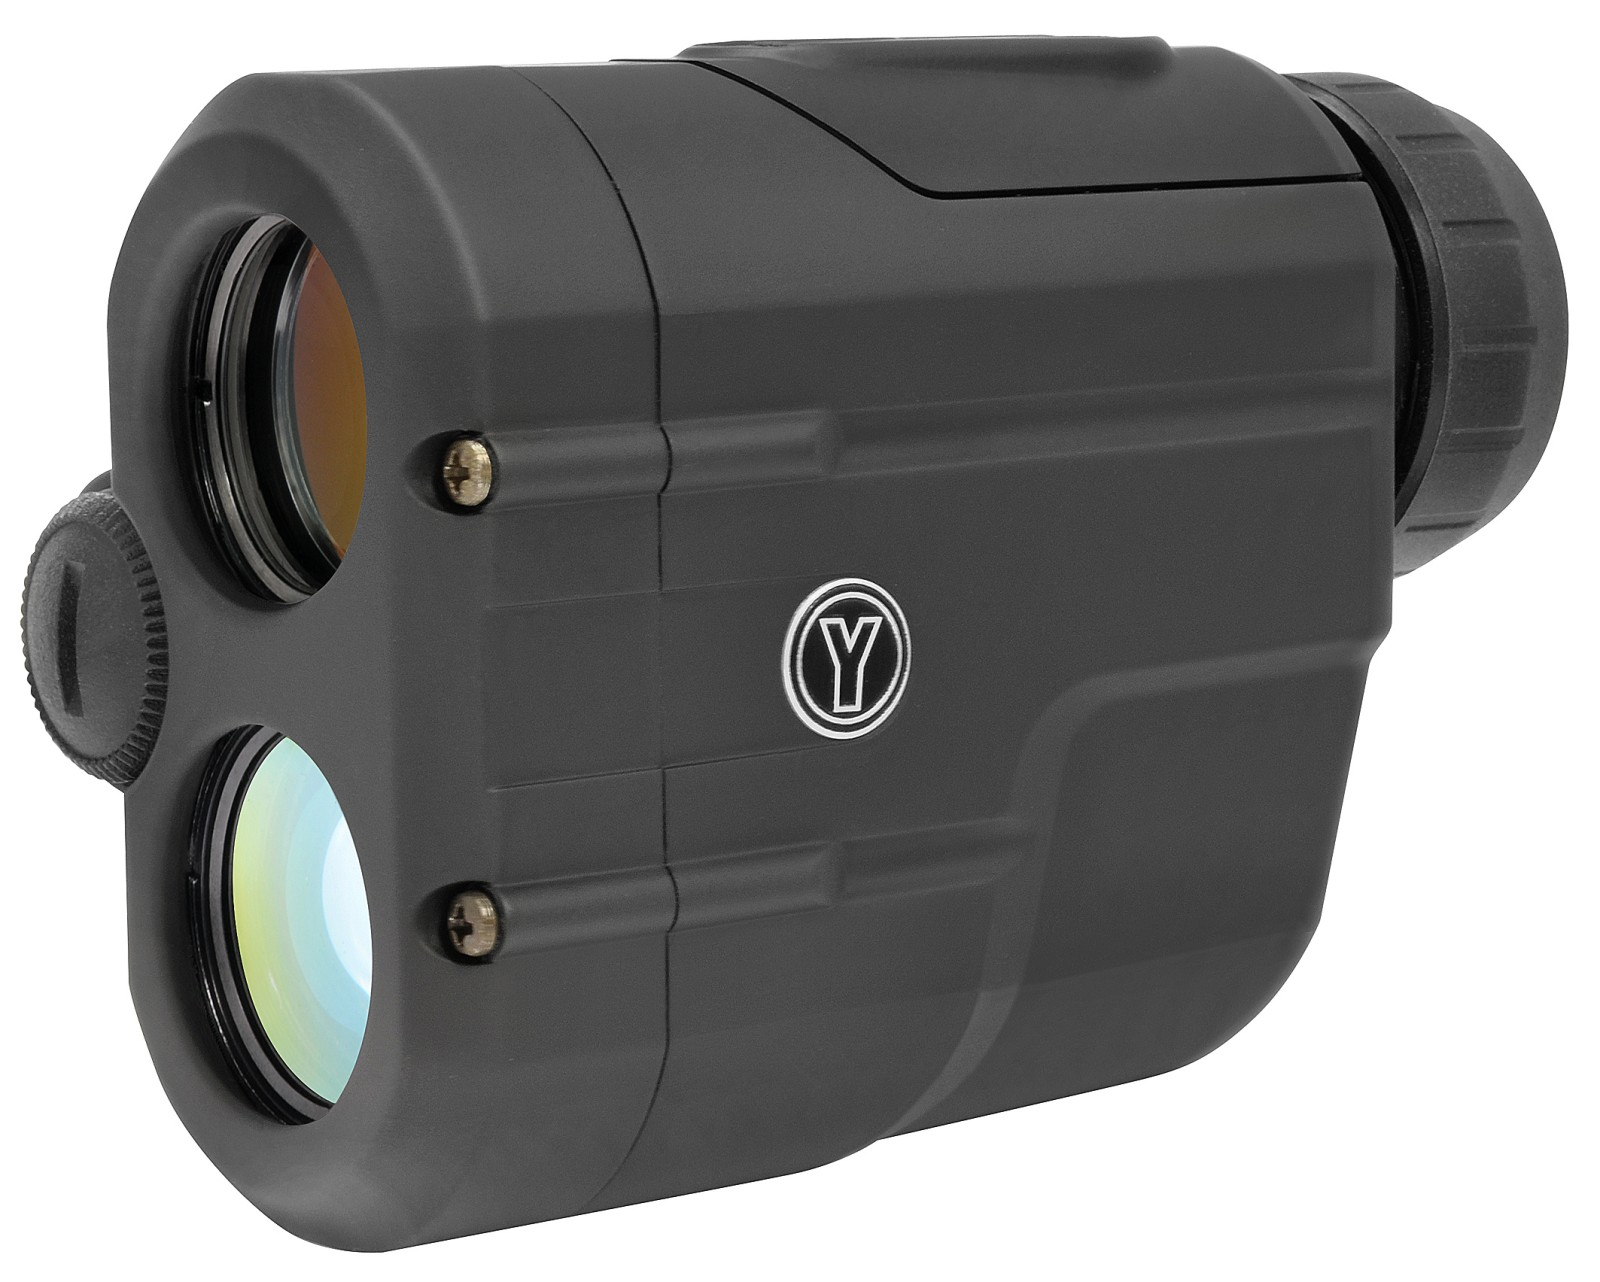 Jagd Entfernungsmesser Gebraucht : Entfernungsmesser jagd gebraucht kaufen meopta meorange hd basic